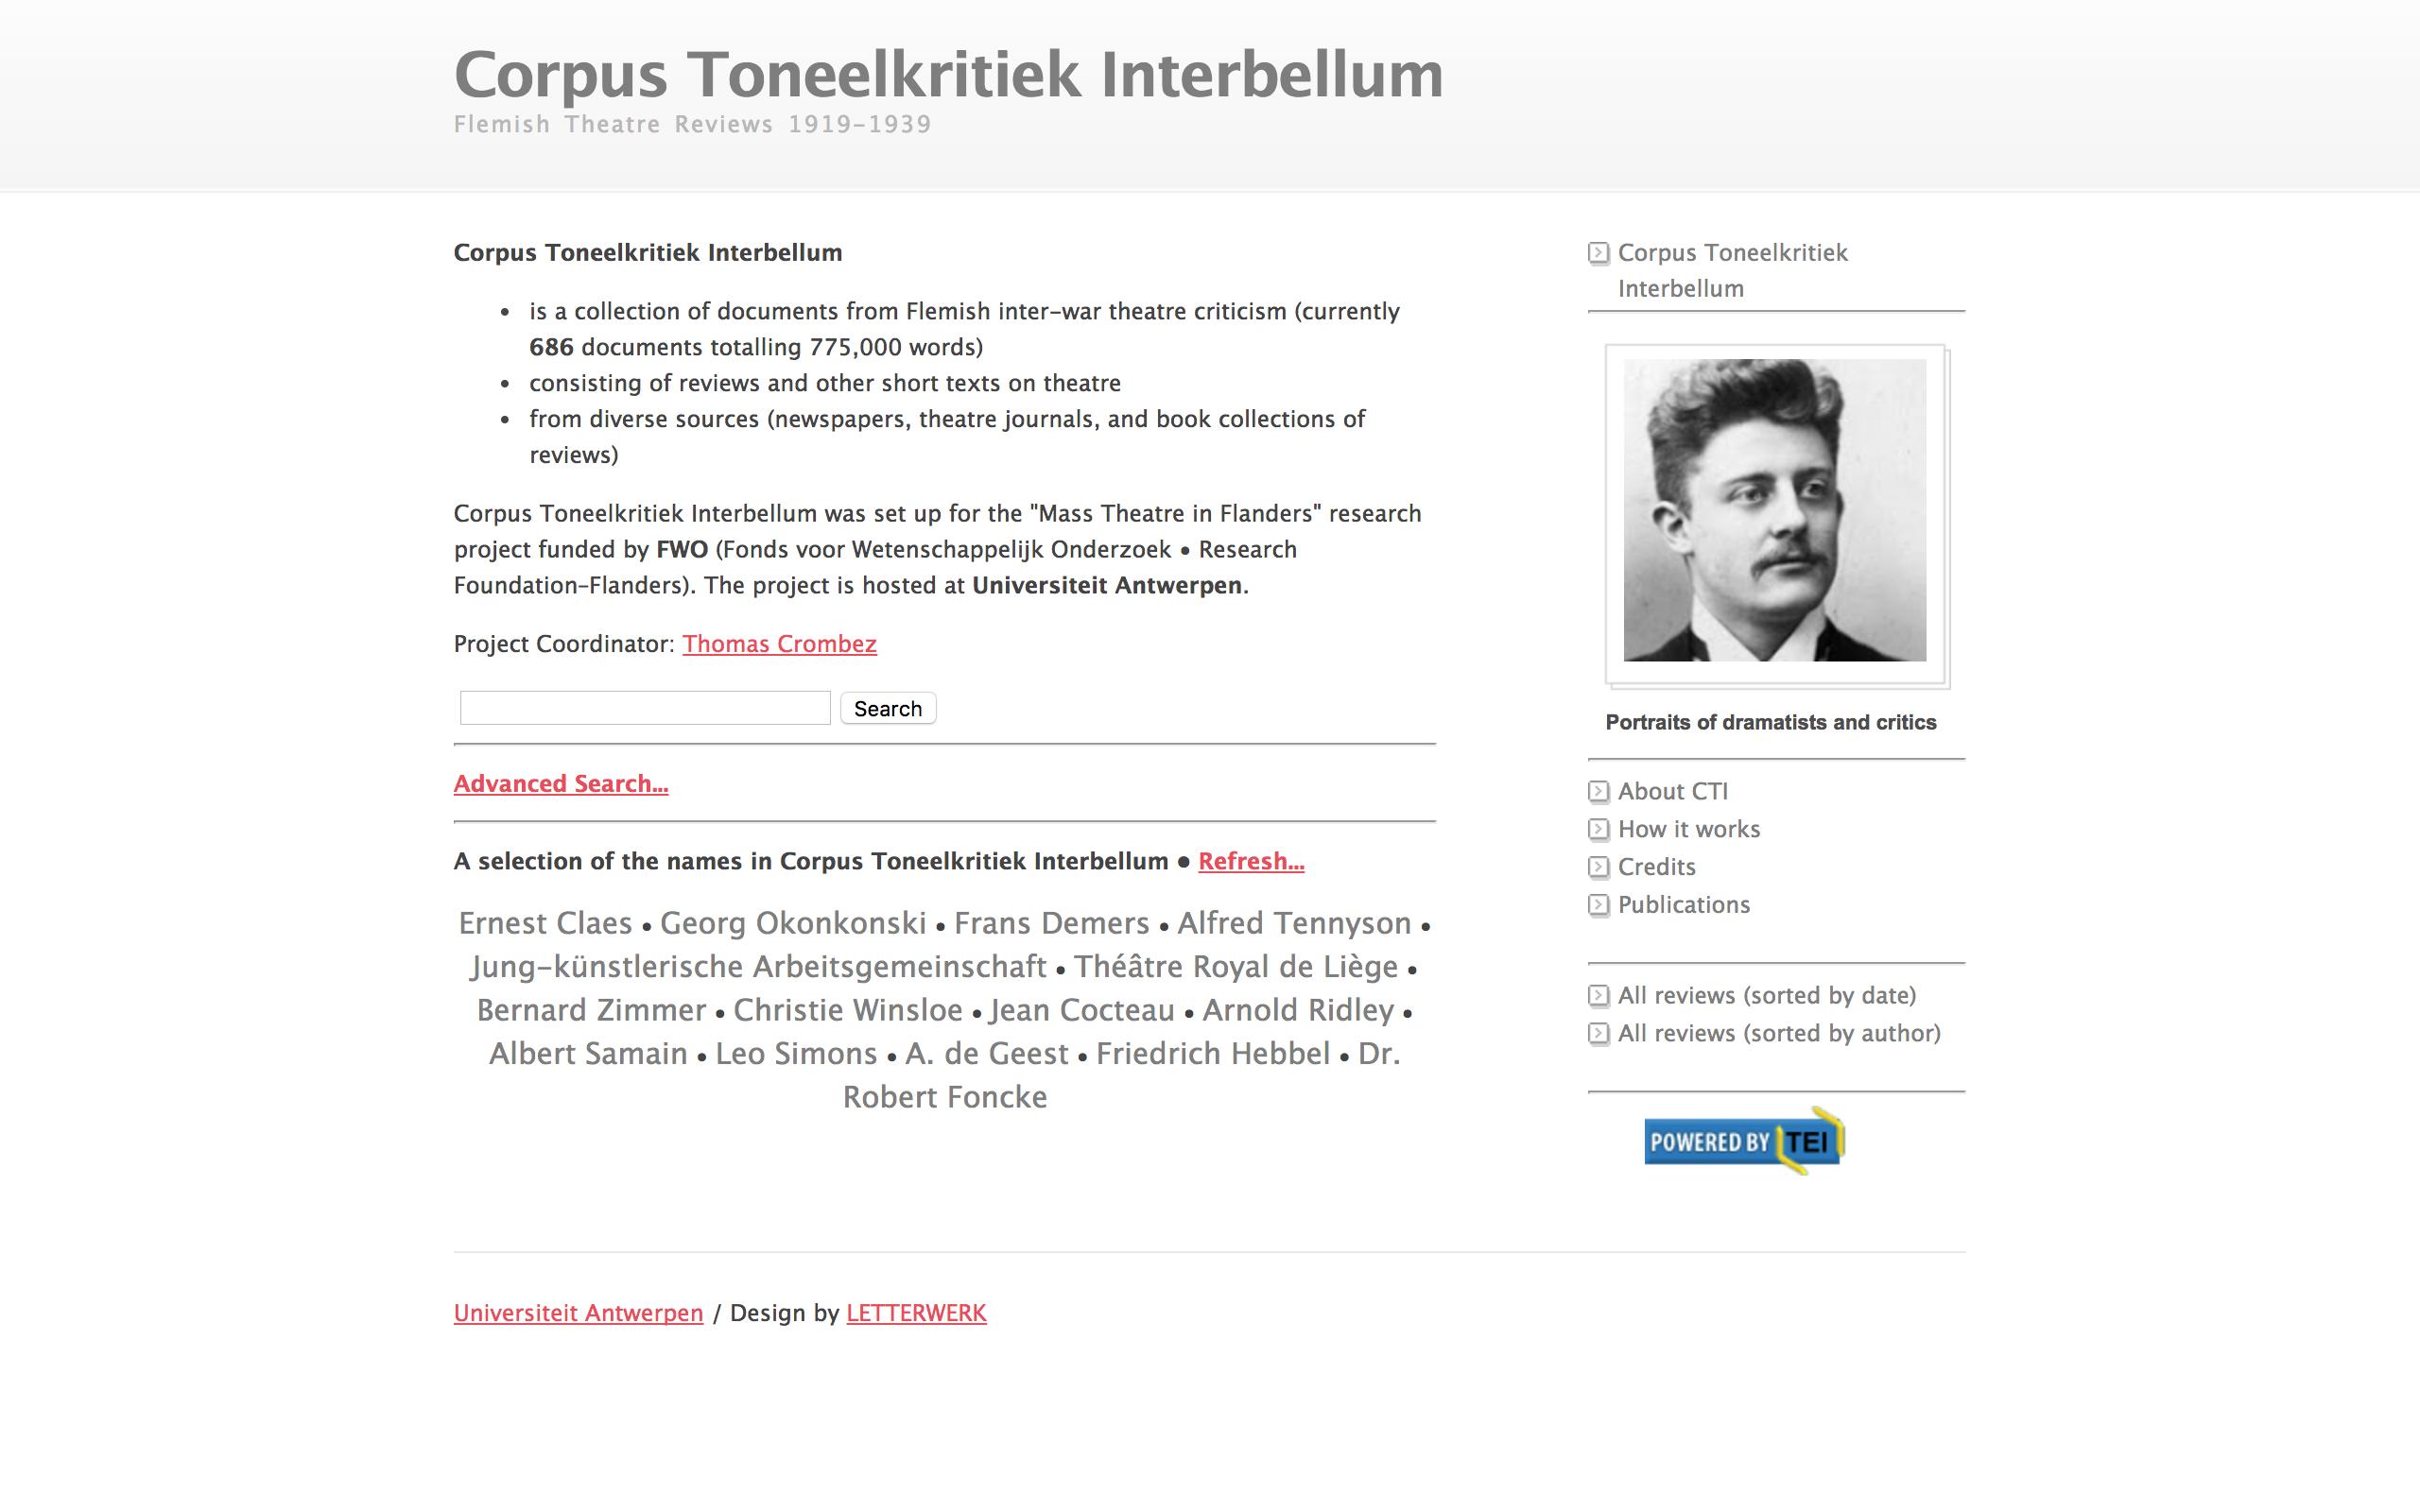 Corpus Toneelkritiek Interbellum